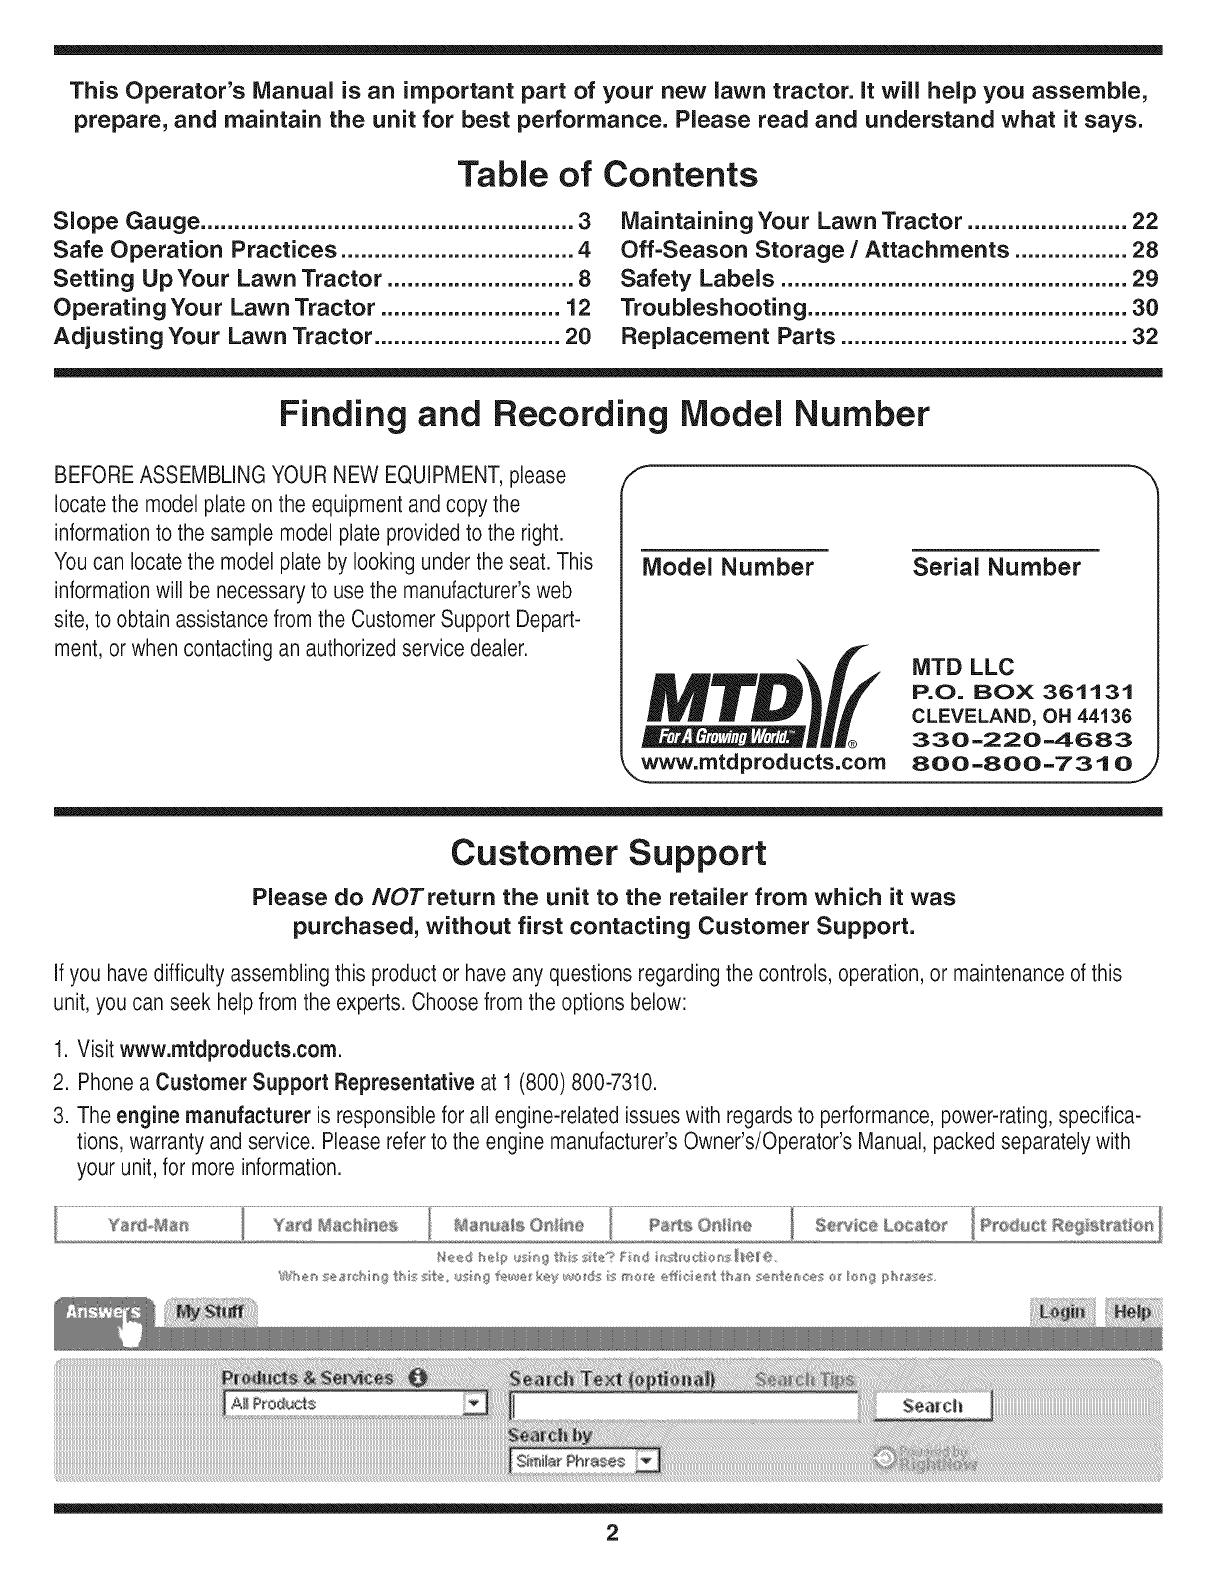 ... service repair manual 1968 1969 1970 1971 1972 Array - mtd 13ax615h730  user manual tractor manuals and guides 1109059l rh usermanual wiki